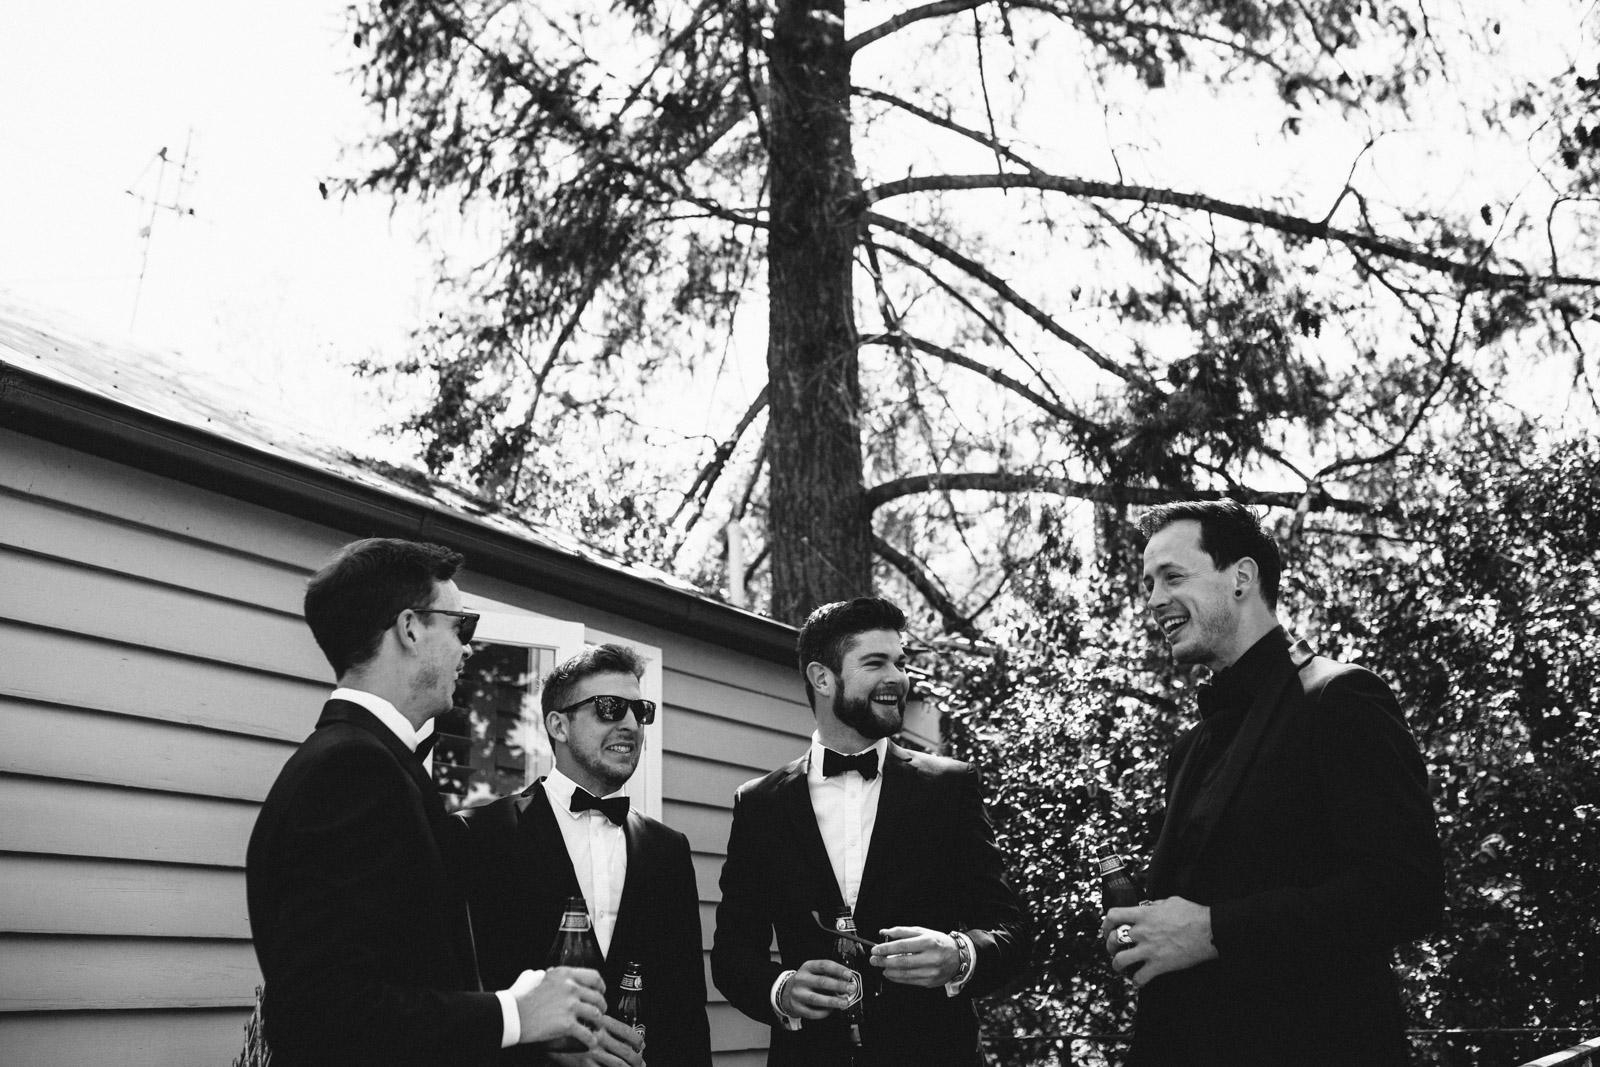 ZD-Melbourne Wedding Photographer-Dean Raphael-11.jpg